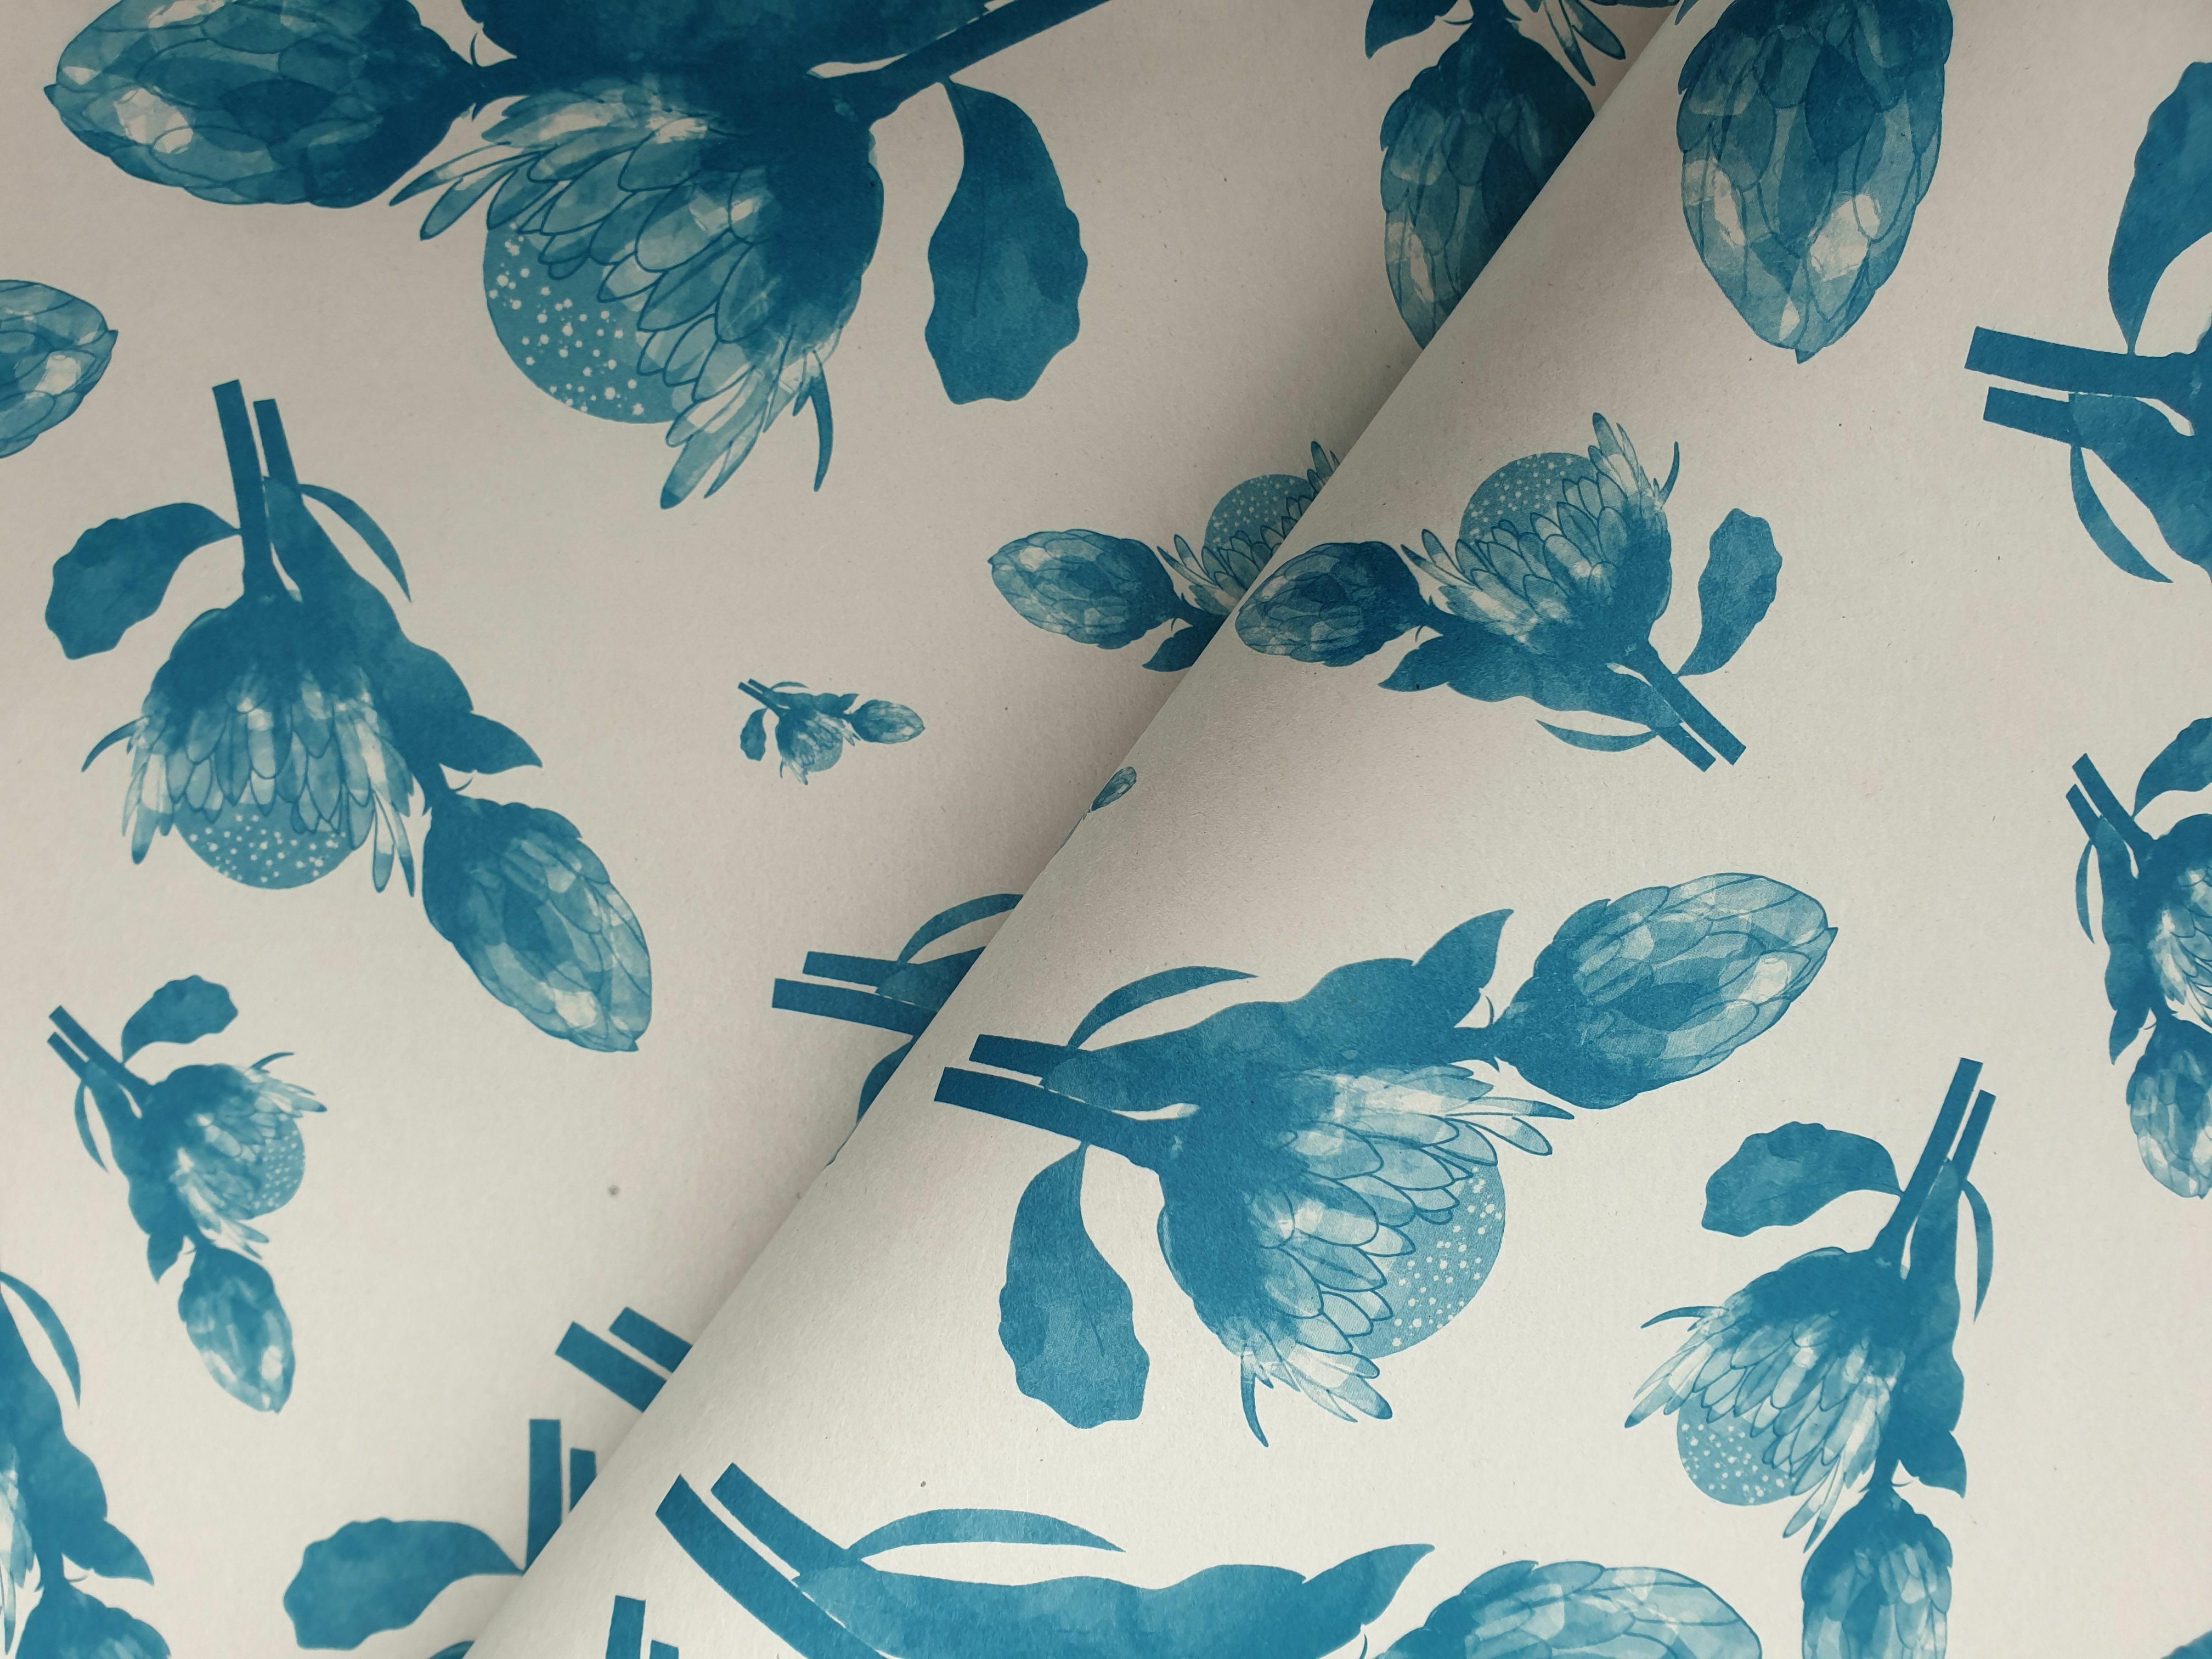 Bespoke Newsprint Reams 420 x 594 Protea Blue (200 sht) BNPPB